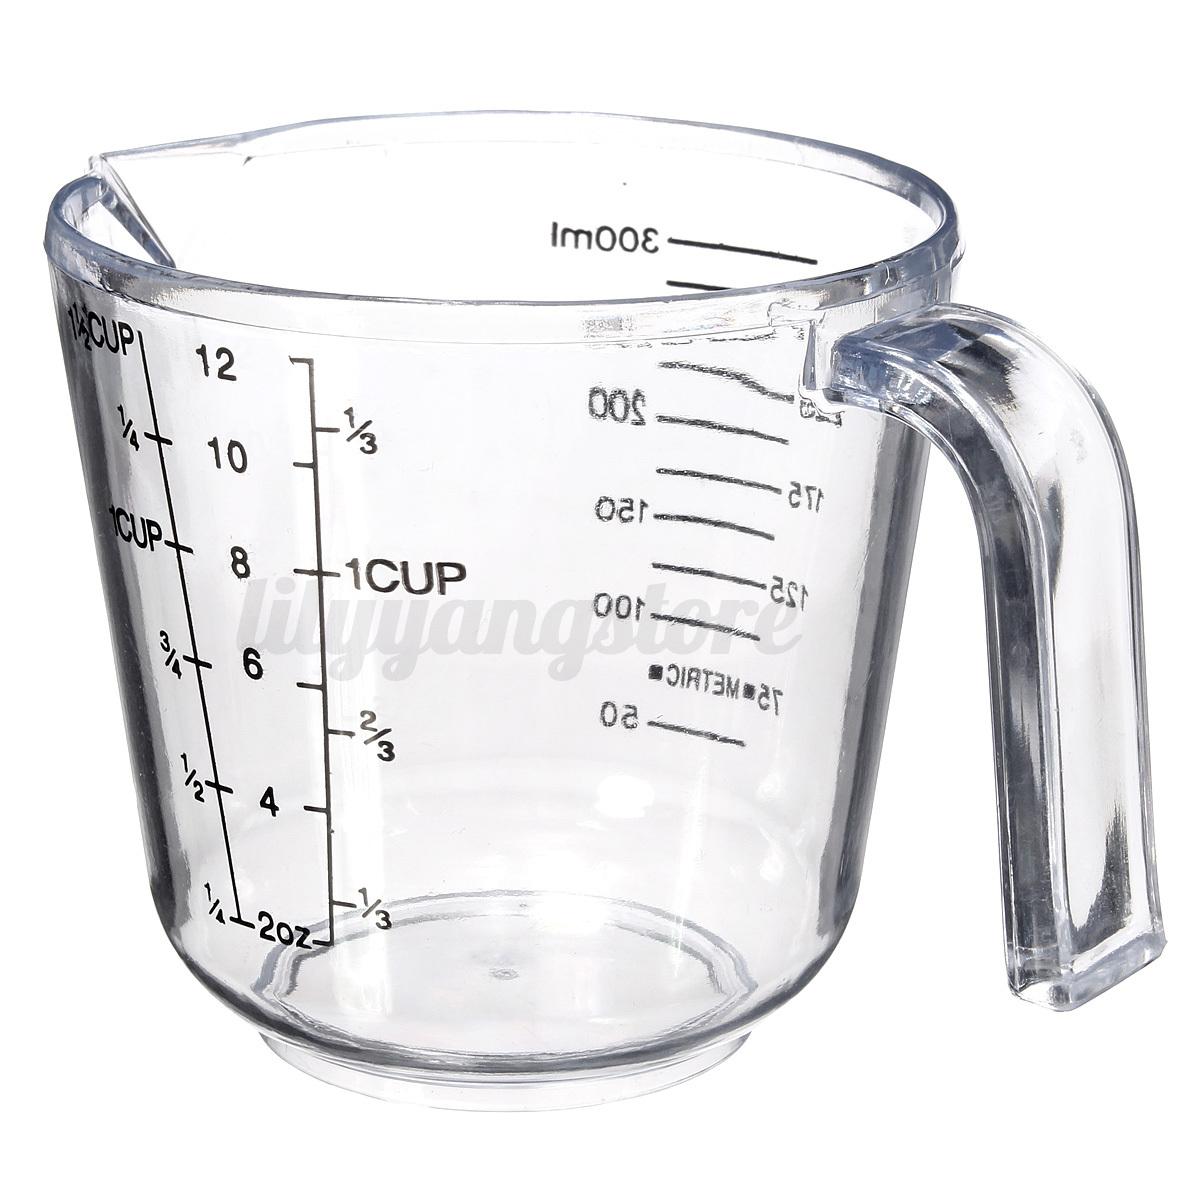 300ml home measuring clear plastic baking jups cups handle pour spout container ebay. Black Bedroom Furniture Sets. Home Design Ideas